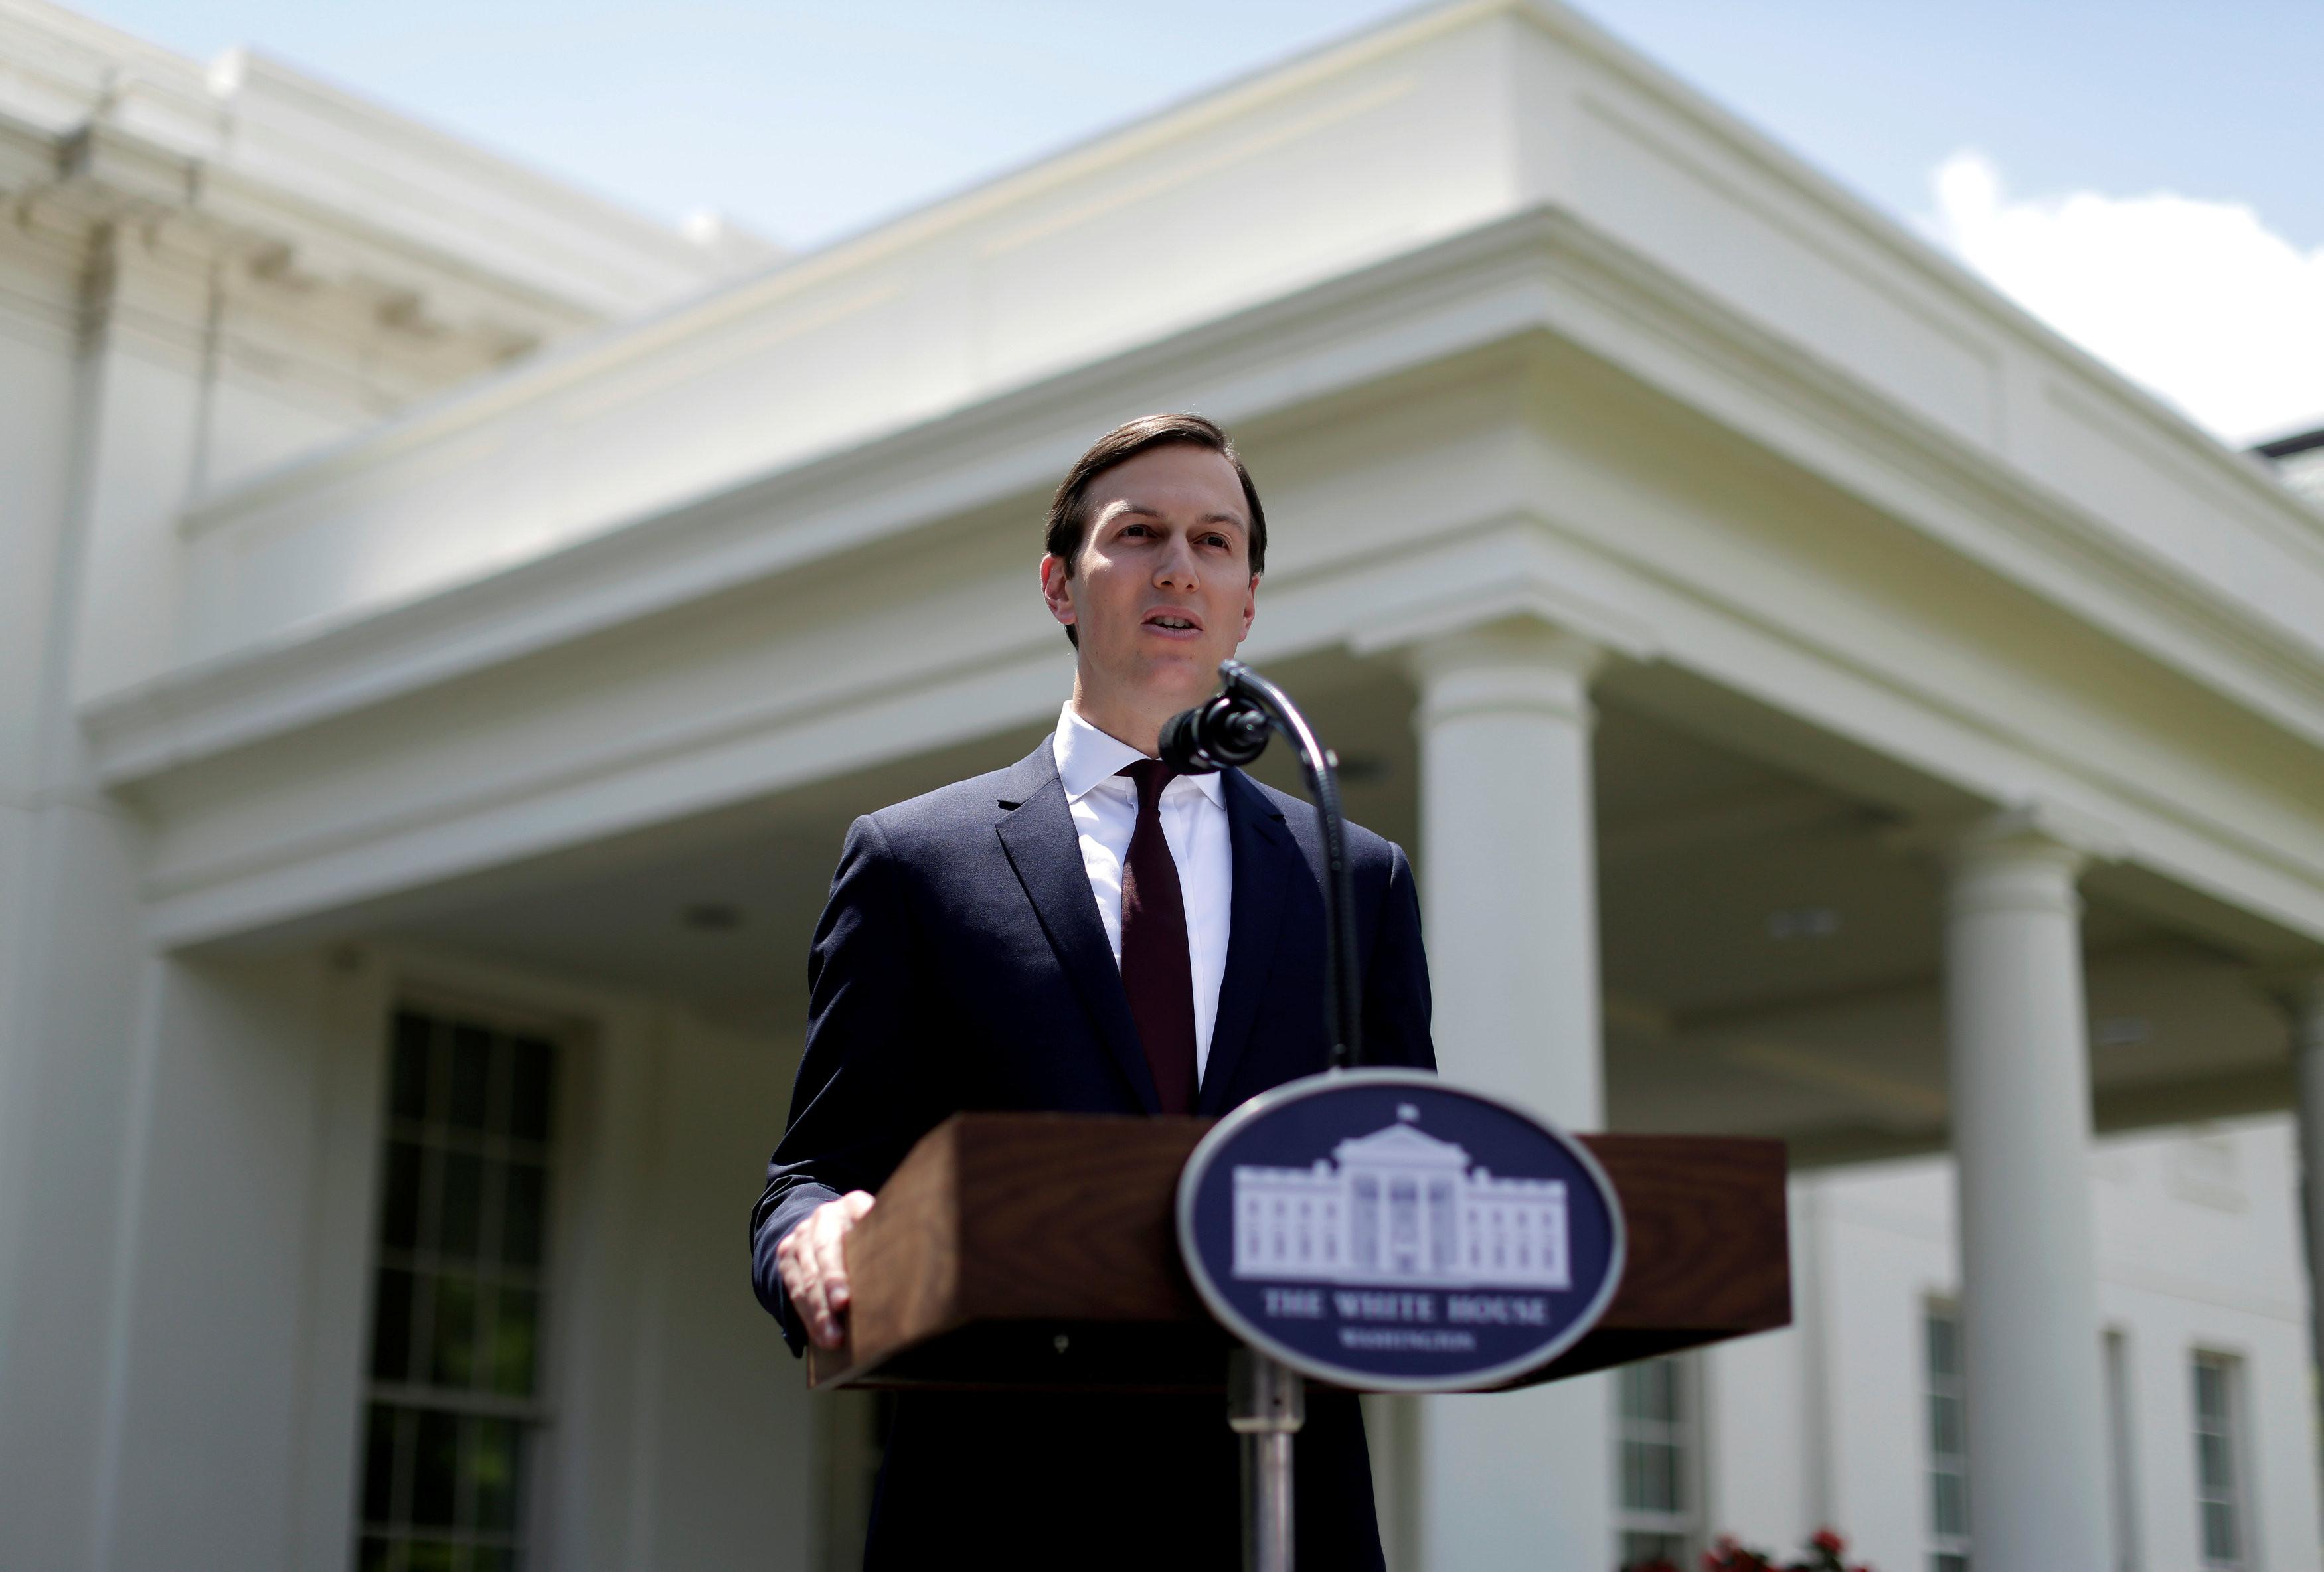 <p><span>Джаред Кушнер. Фото: &copy; REUTERS/Joshua Roberts</span></p>